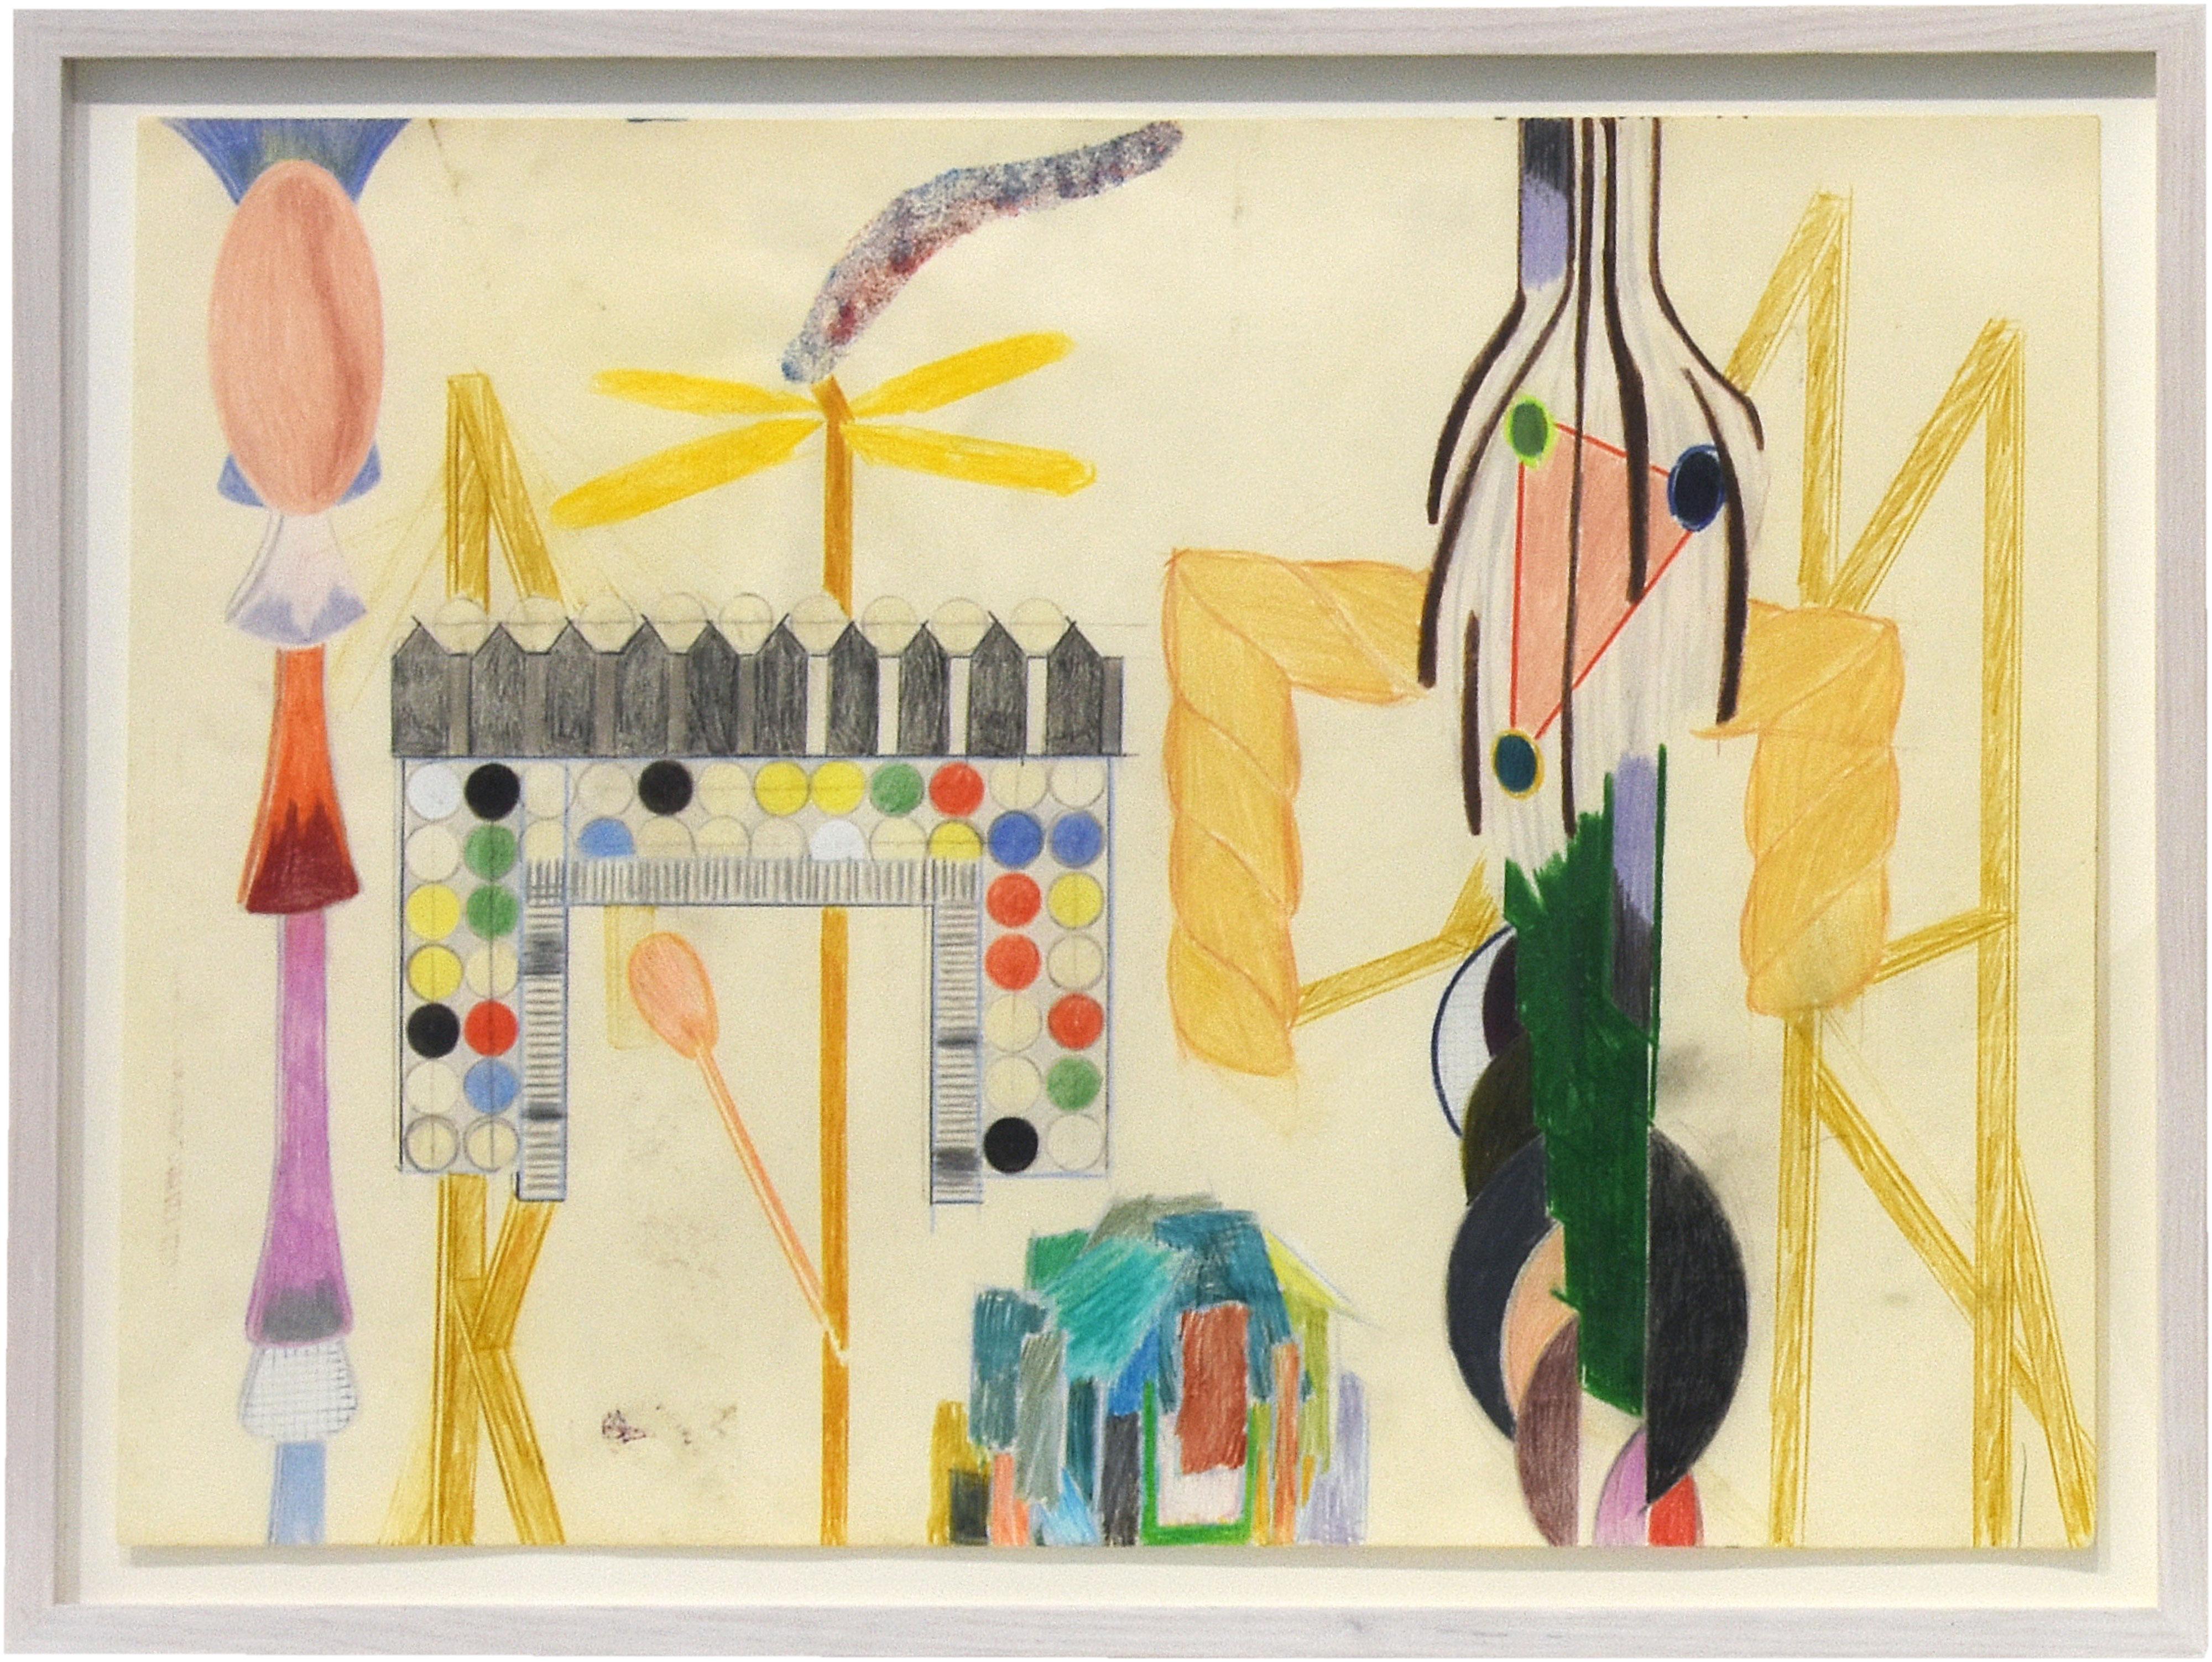 Galerie Barbara Thumm \ Untitled